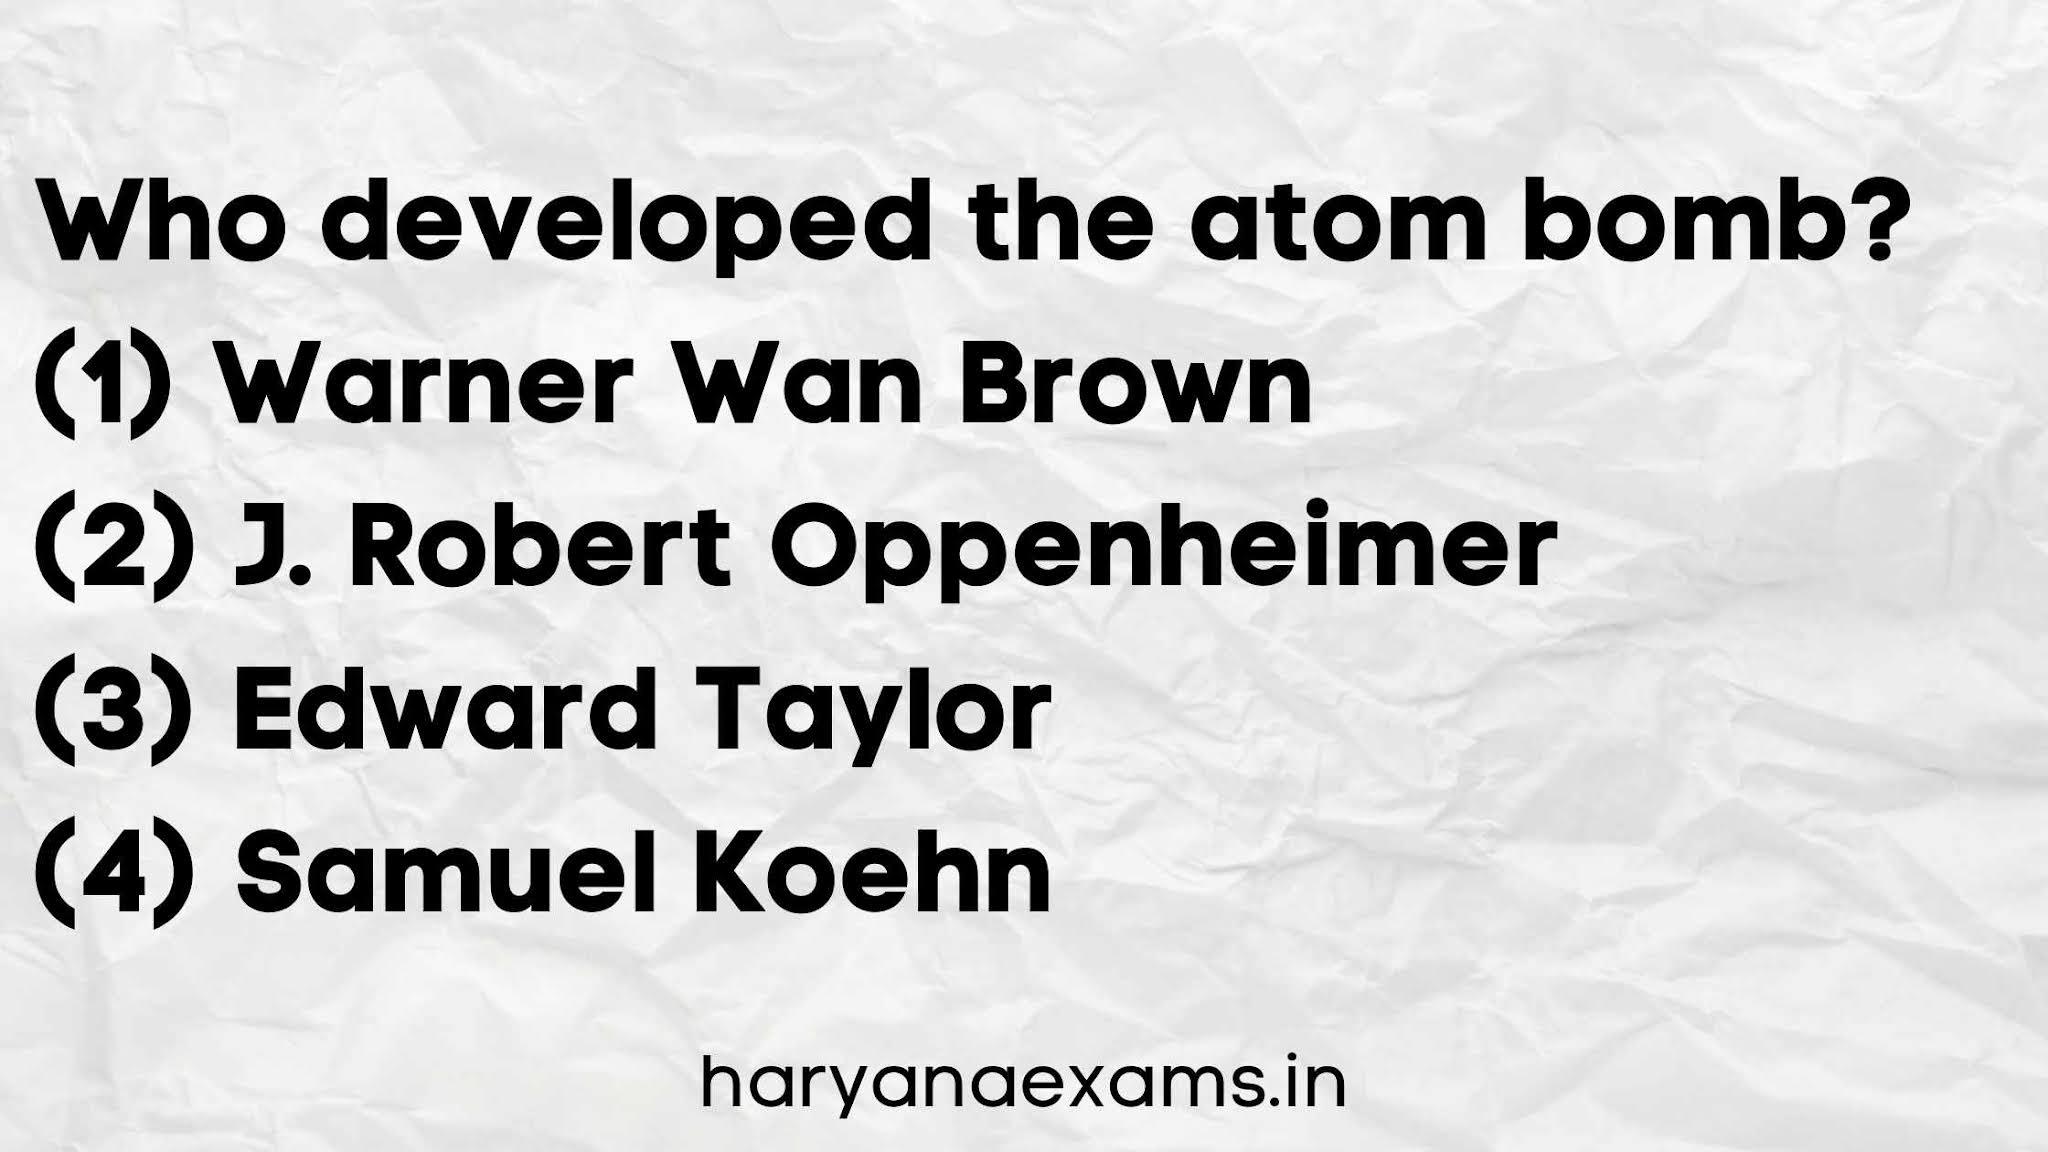 Who developed the atom bomb?   (1) Warner Wan Brown   (2) J. Robert Oppenheimer   (3) Edward Taylor   (4) Samuel Koehn